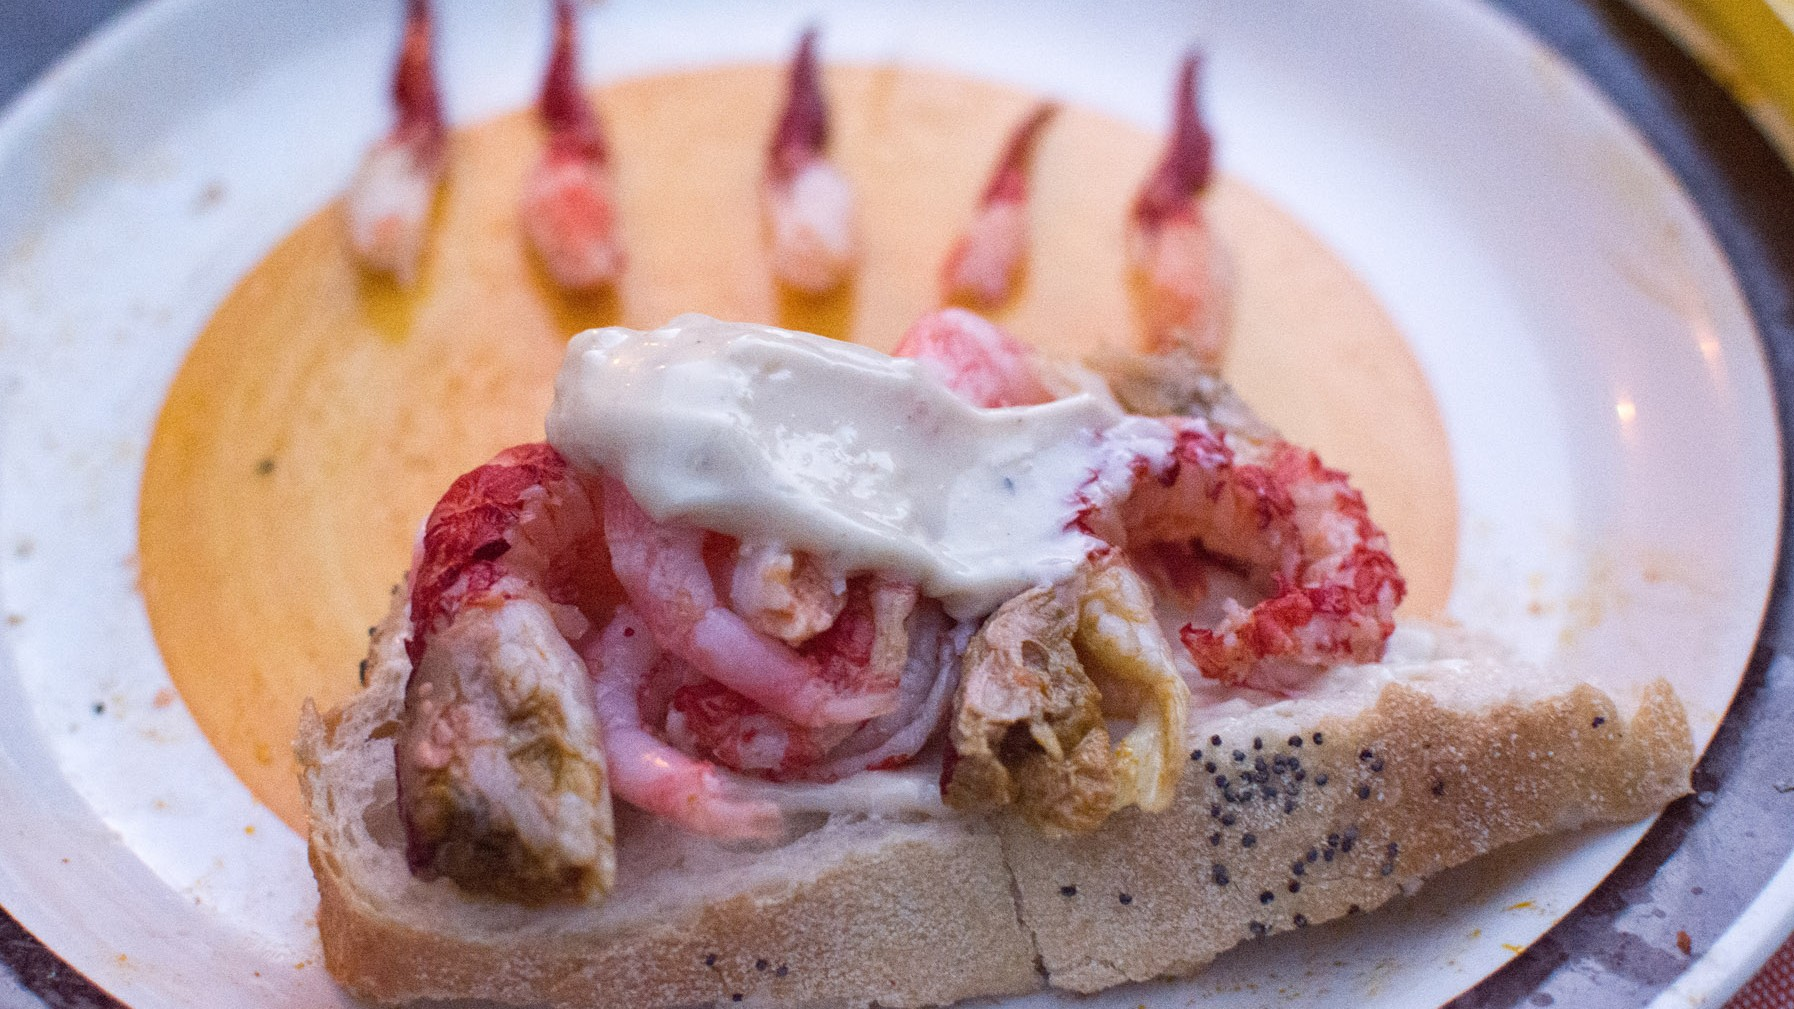 crayfish party - shellfish sandwich, photo by Frans Ljus